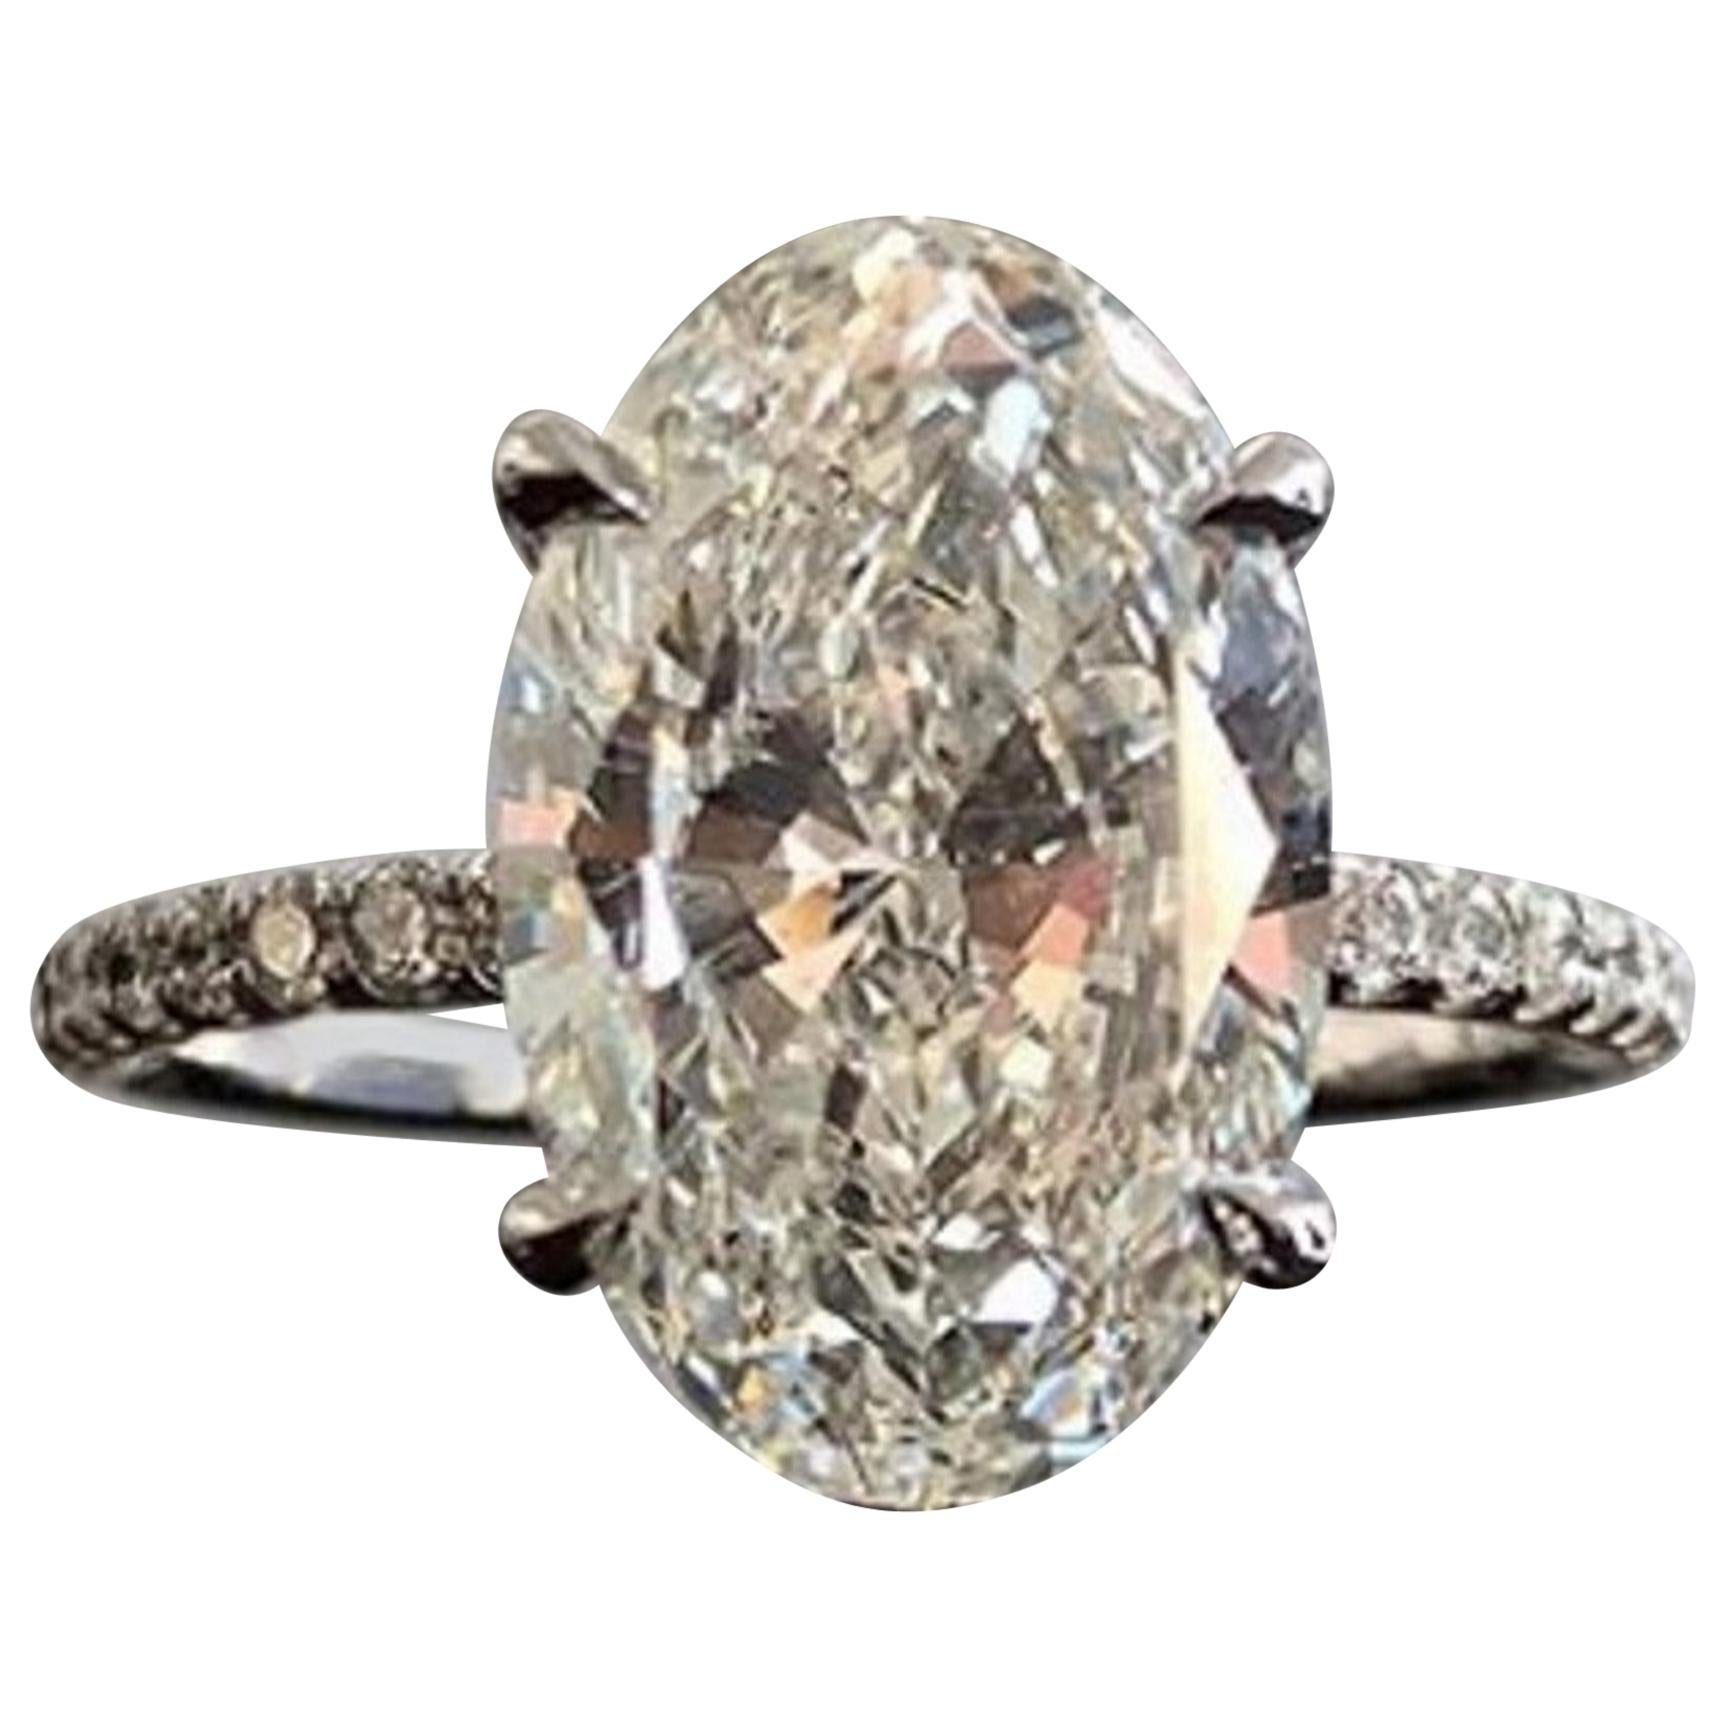 Flawless GIA Certified 7.31 Carat Oval Diamond Ring